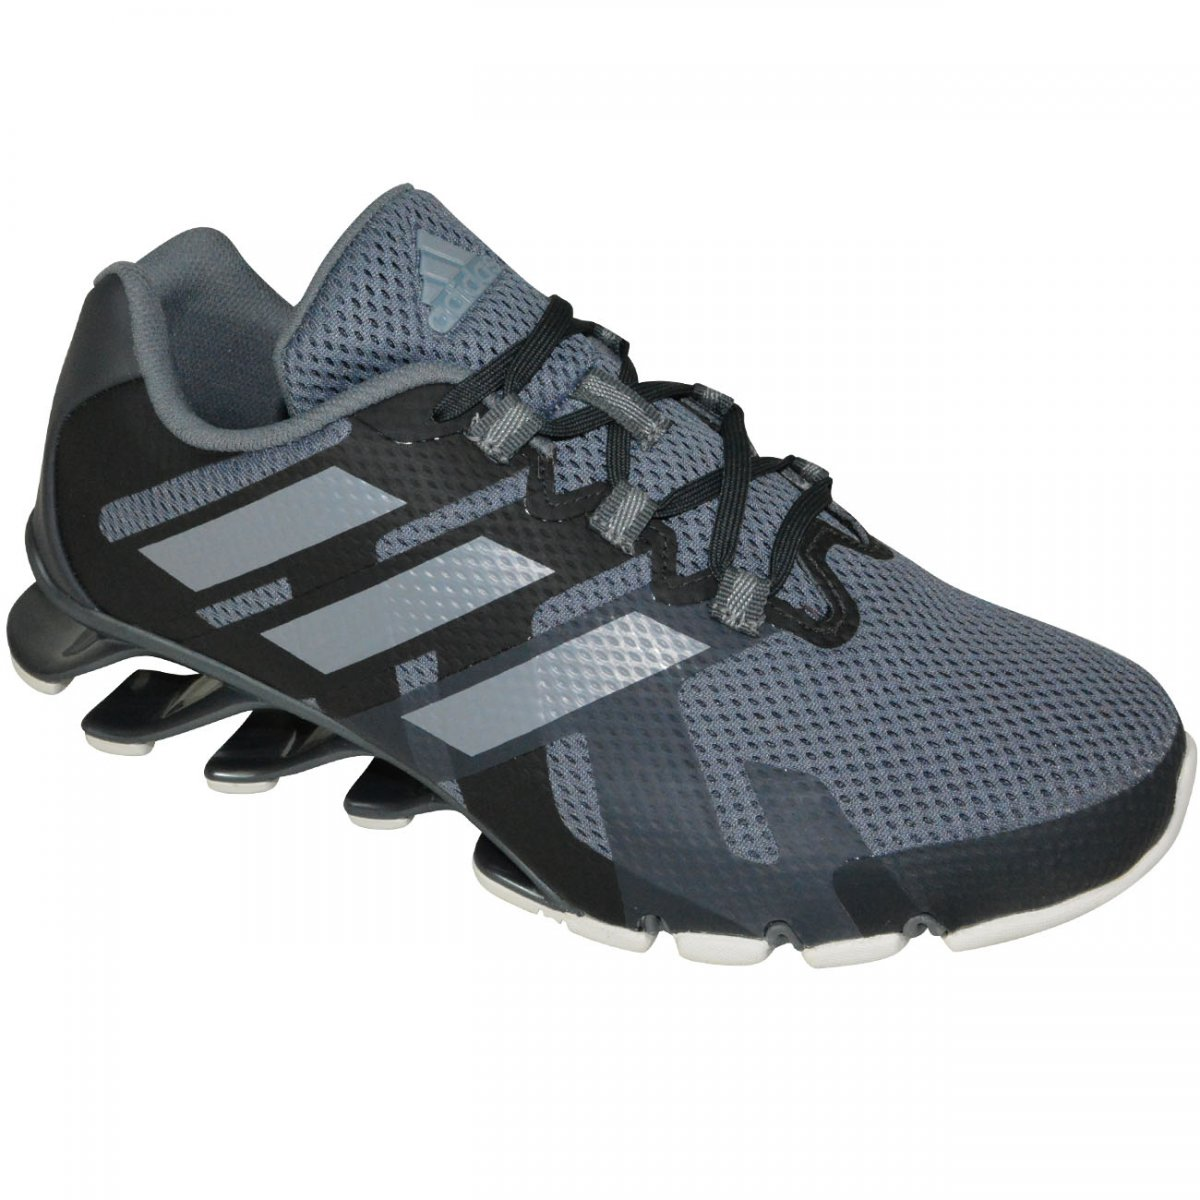 235bdae638e Tenis Adidas Springblade E-Force M B49421 - Chumbo Preto - Chuteira Nike